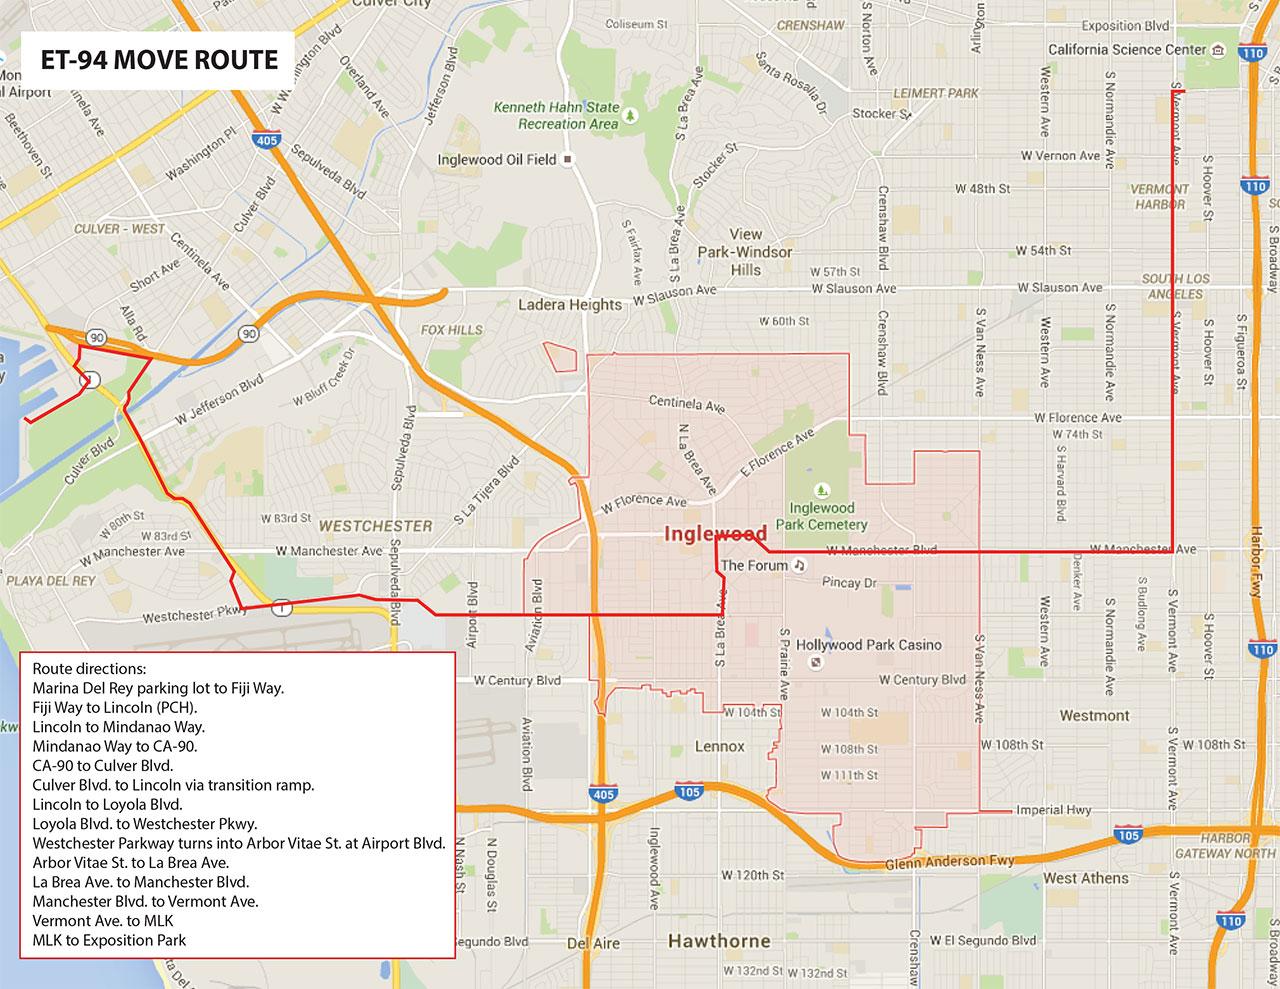 NASAs Last Space Shuttle External Tank To Cross Oceans LA - Los angeles route map